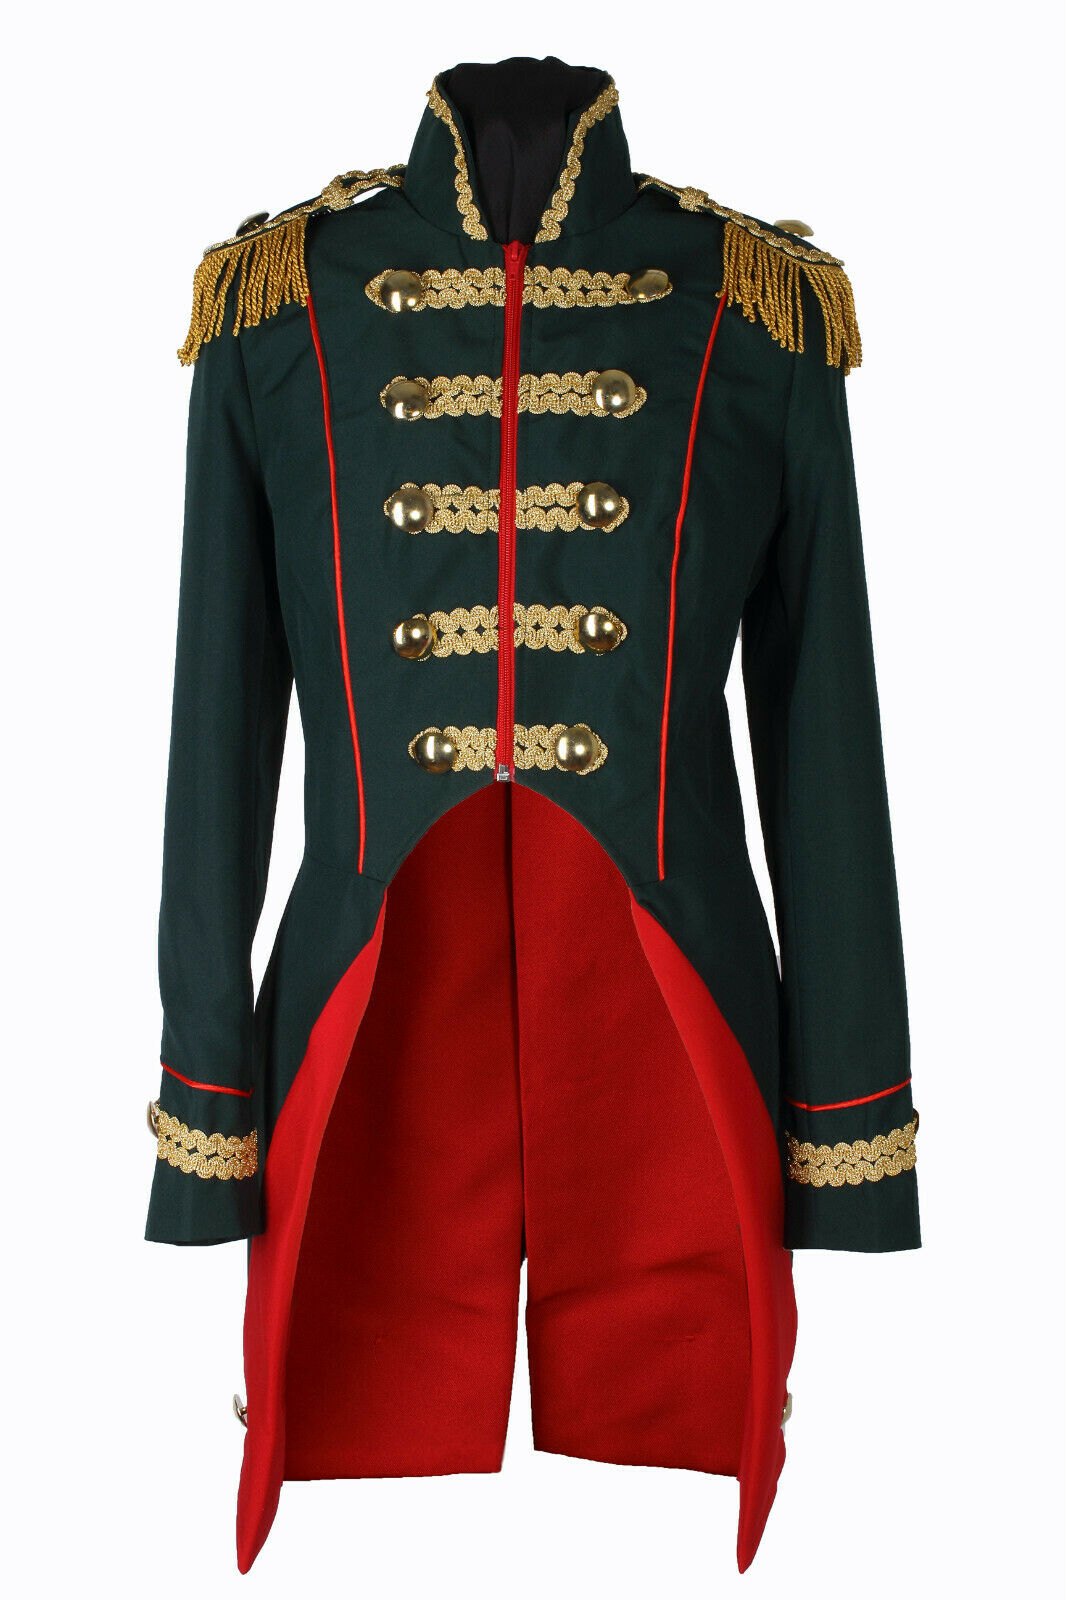 Damen Soldat Jacke Karnevalskostüm Uniform Fasching Gehrock Köln 36-54 Grün